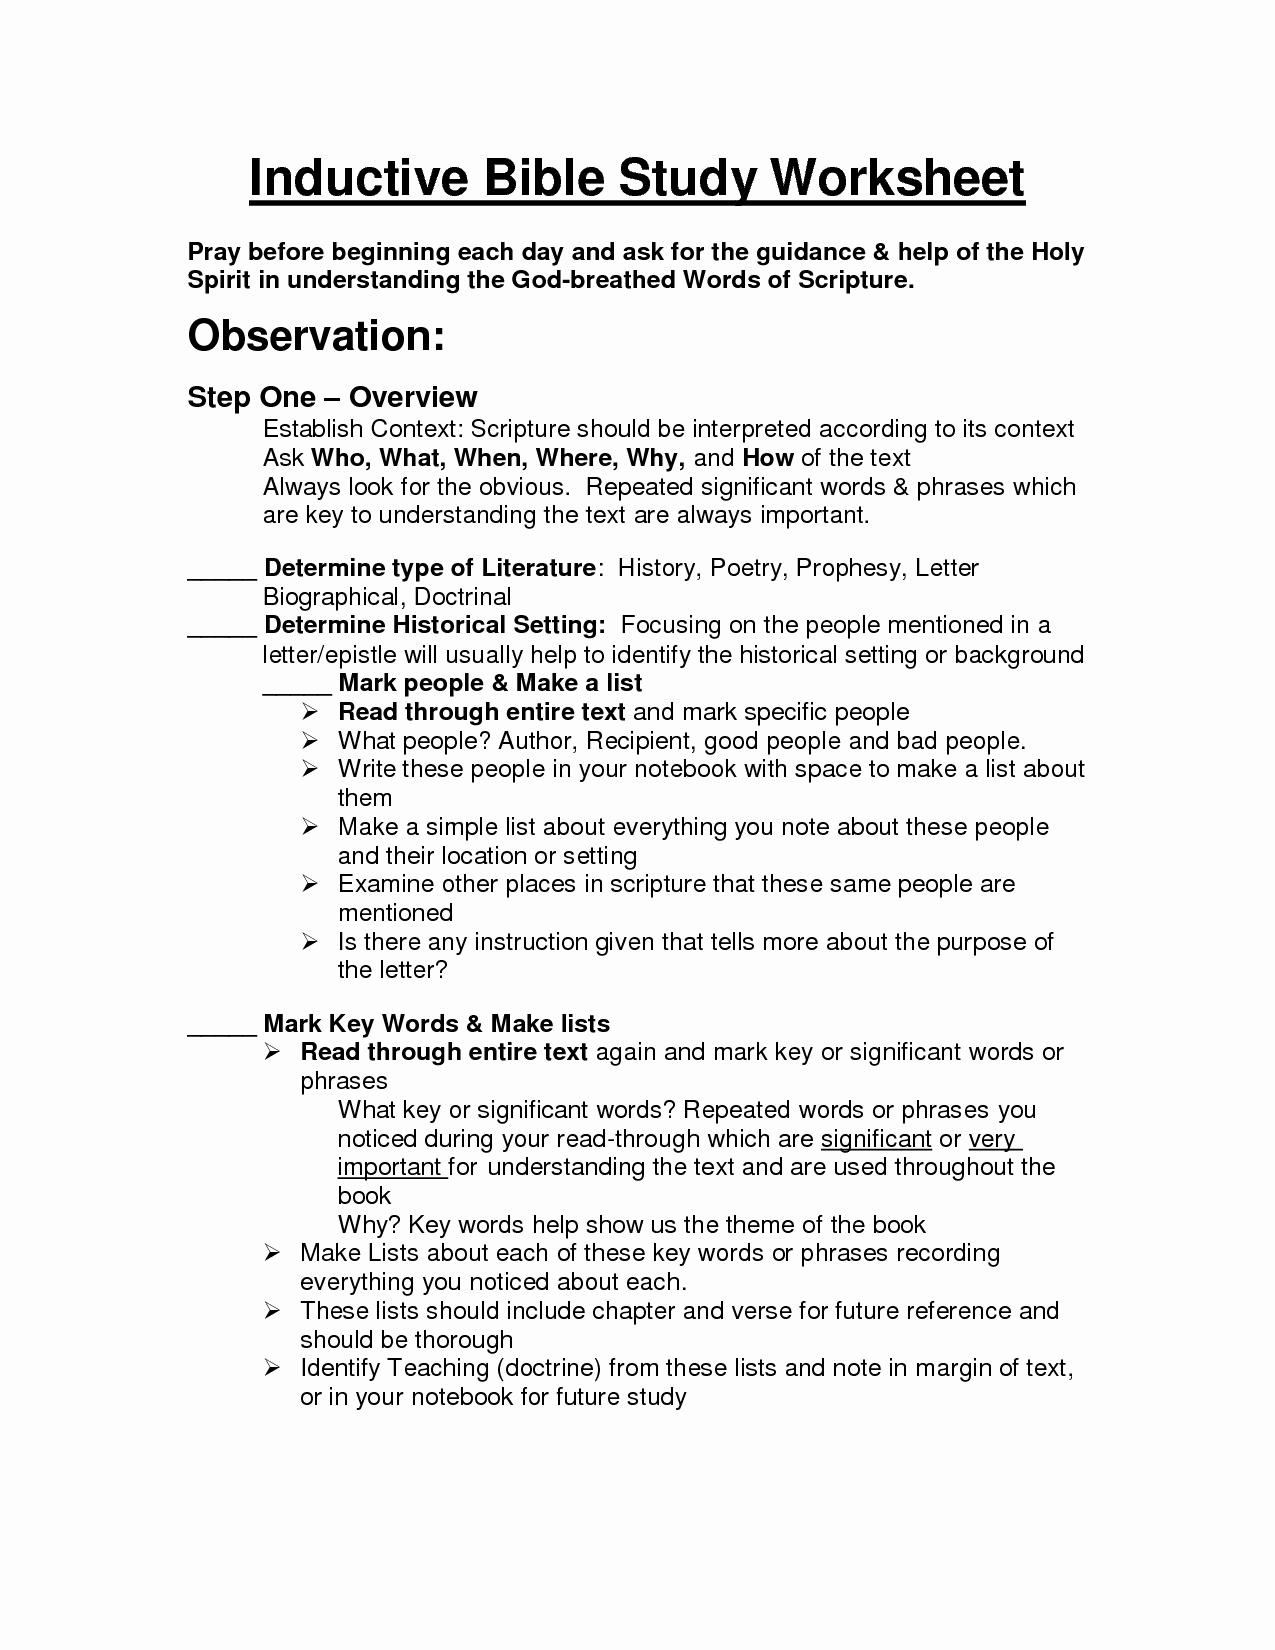 20 Printable Bible Study Worksheets – Diocesisdemonteria - Free Printable Bible Study Worksheets For Adults